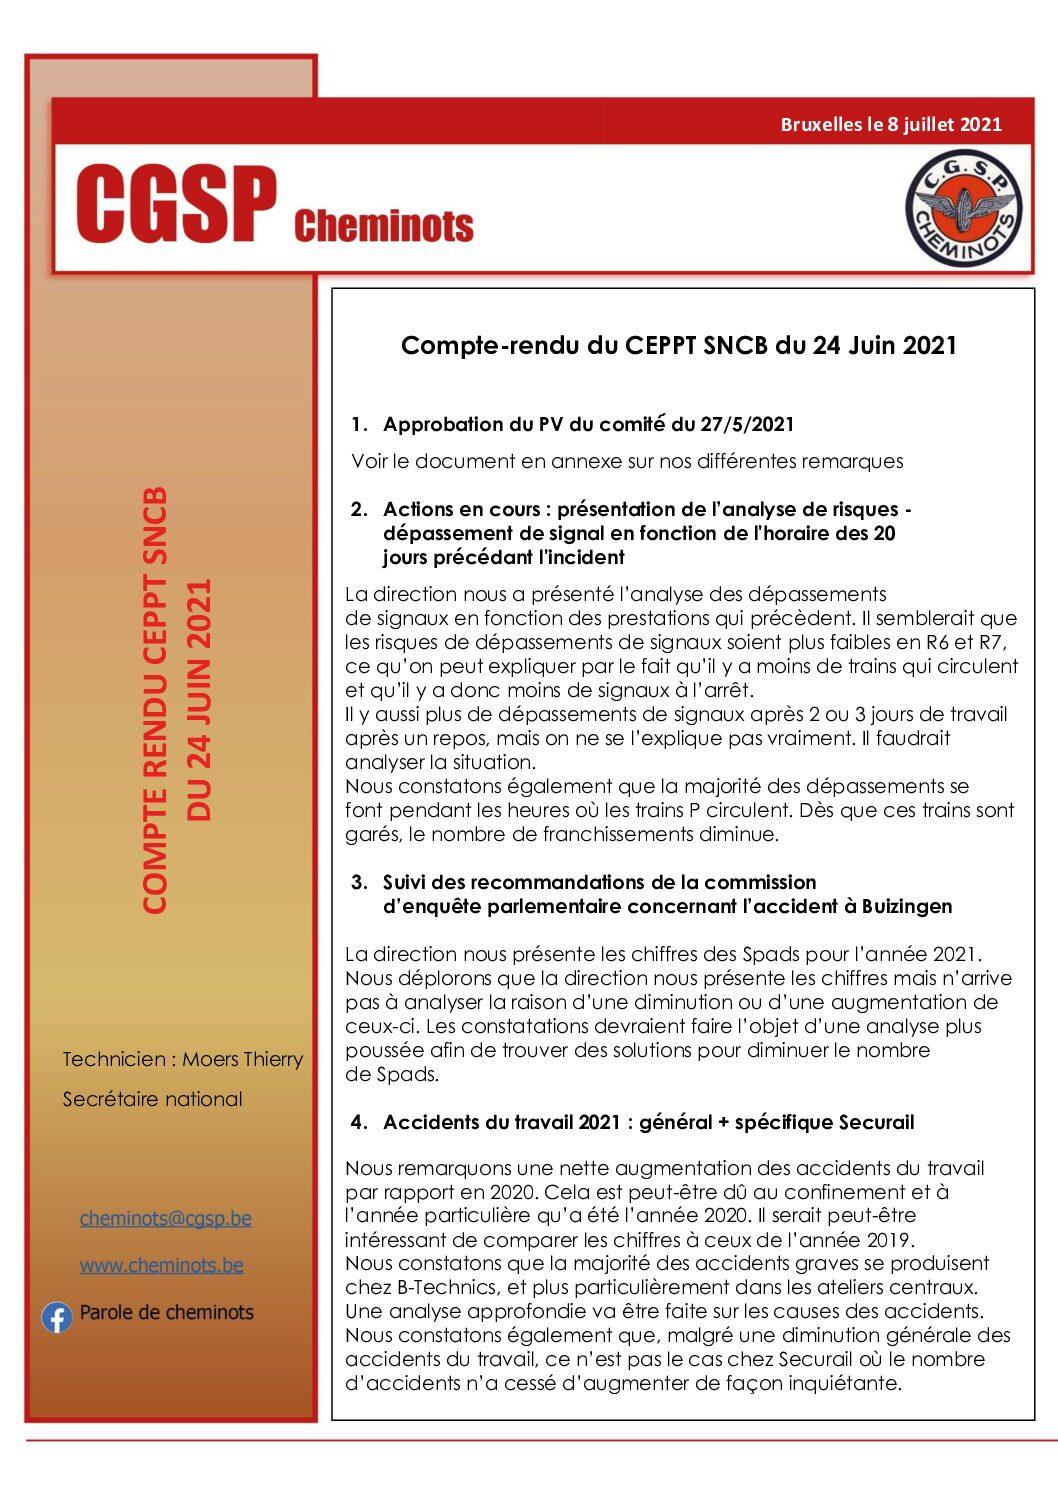 CEPPT SNCB 24 juin 2021